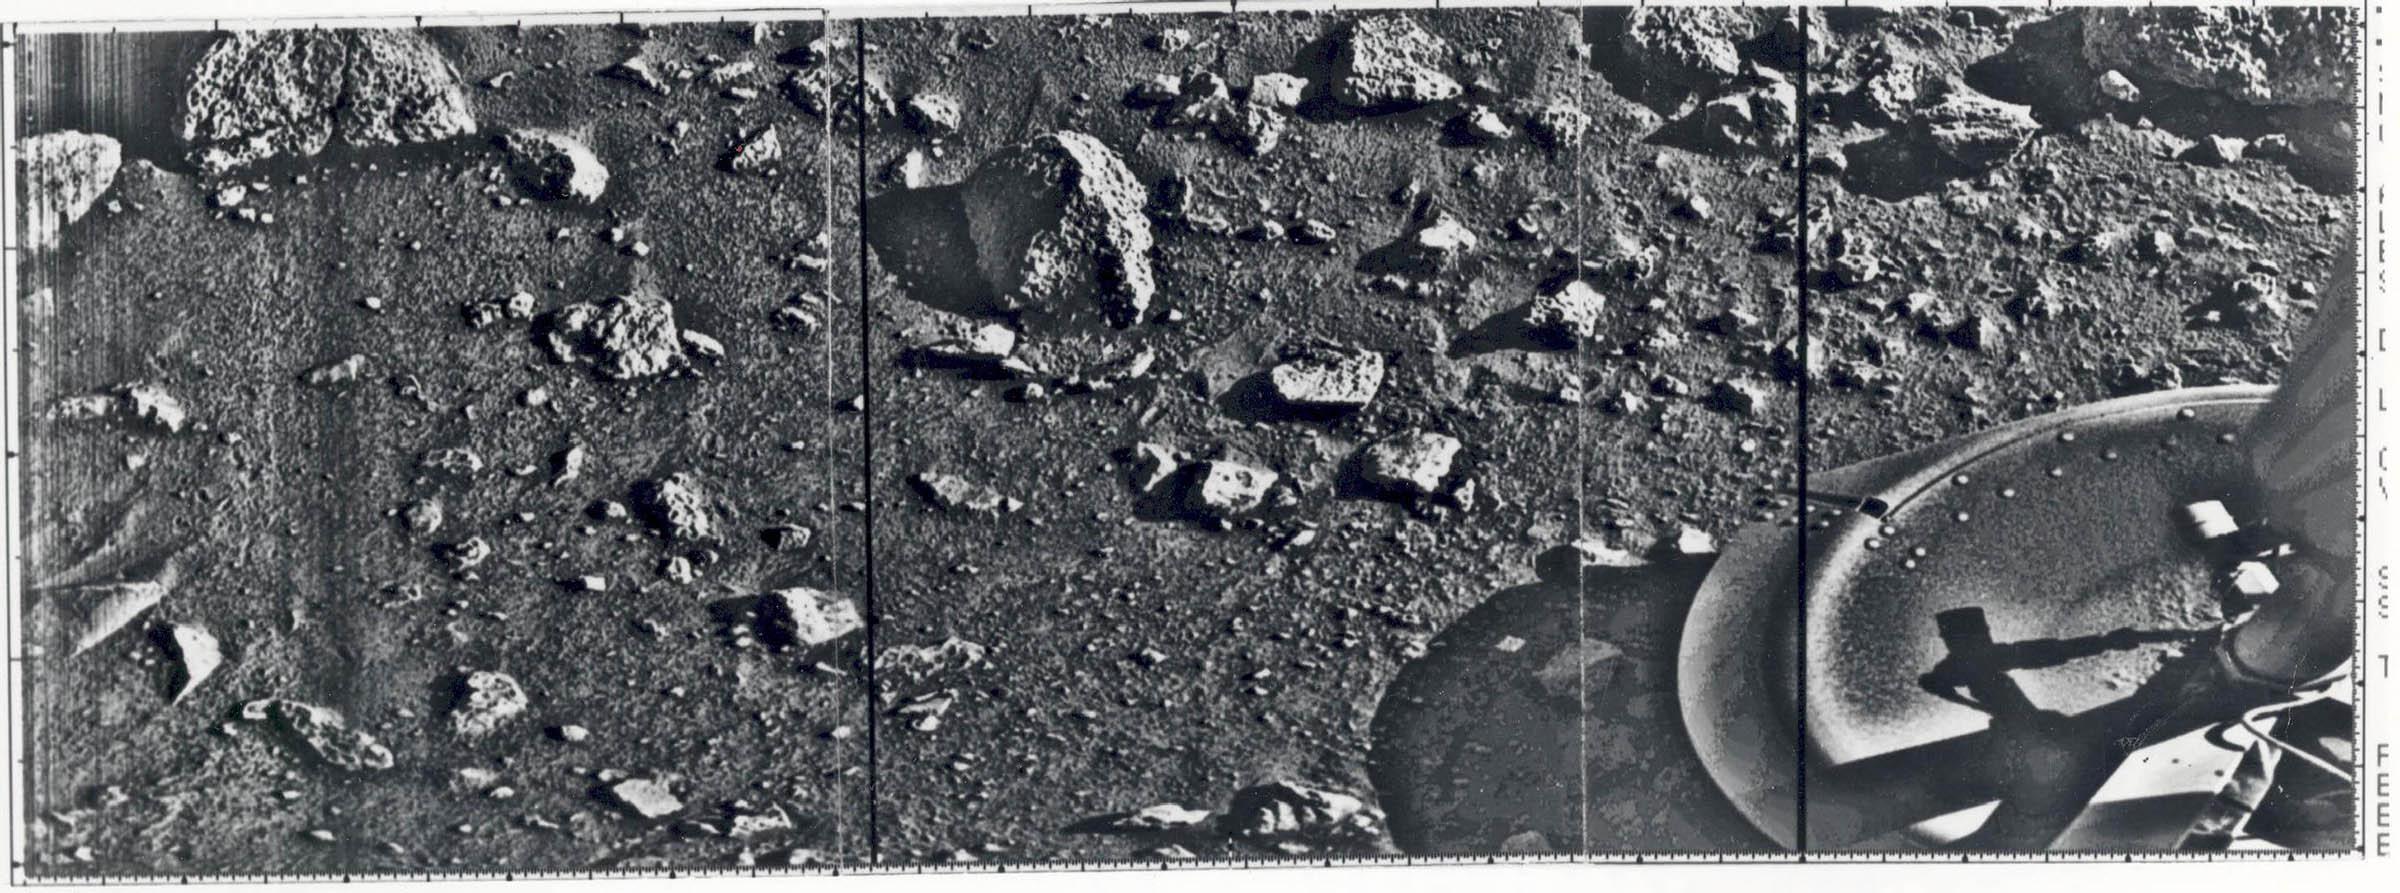 first mars landing 1976 - photo #21